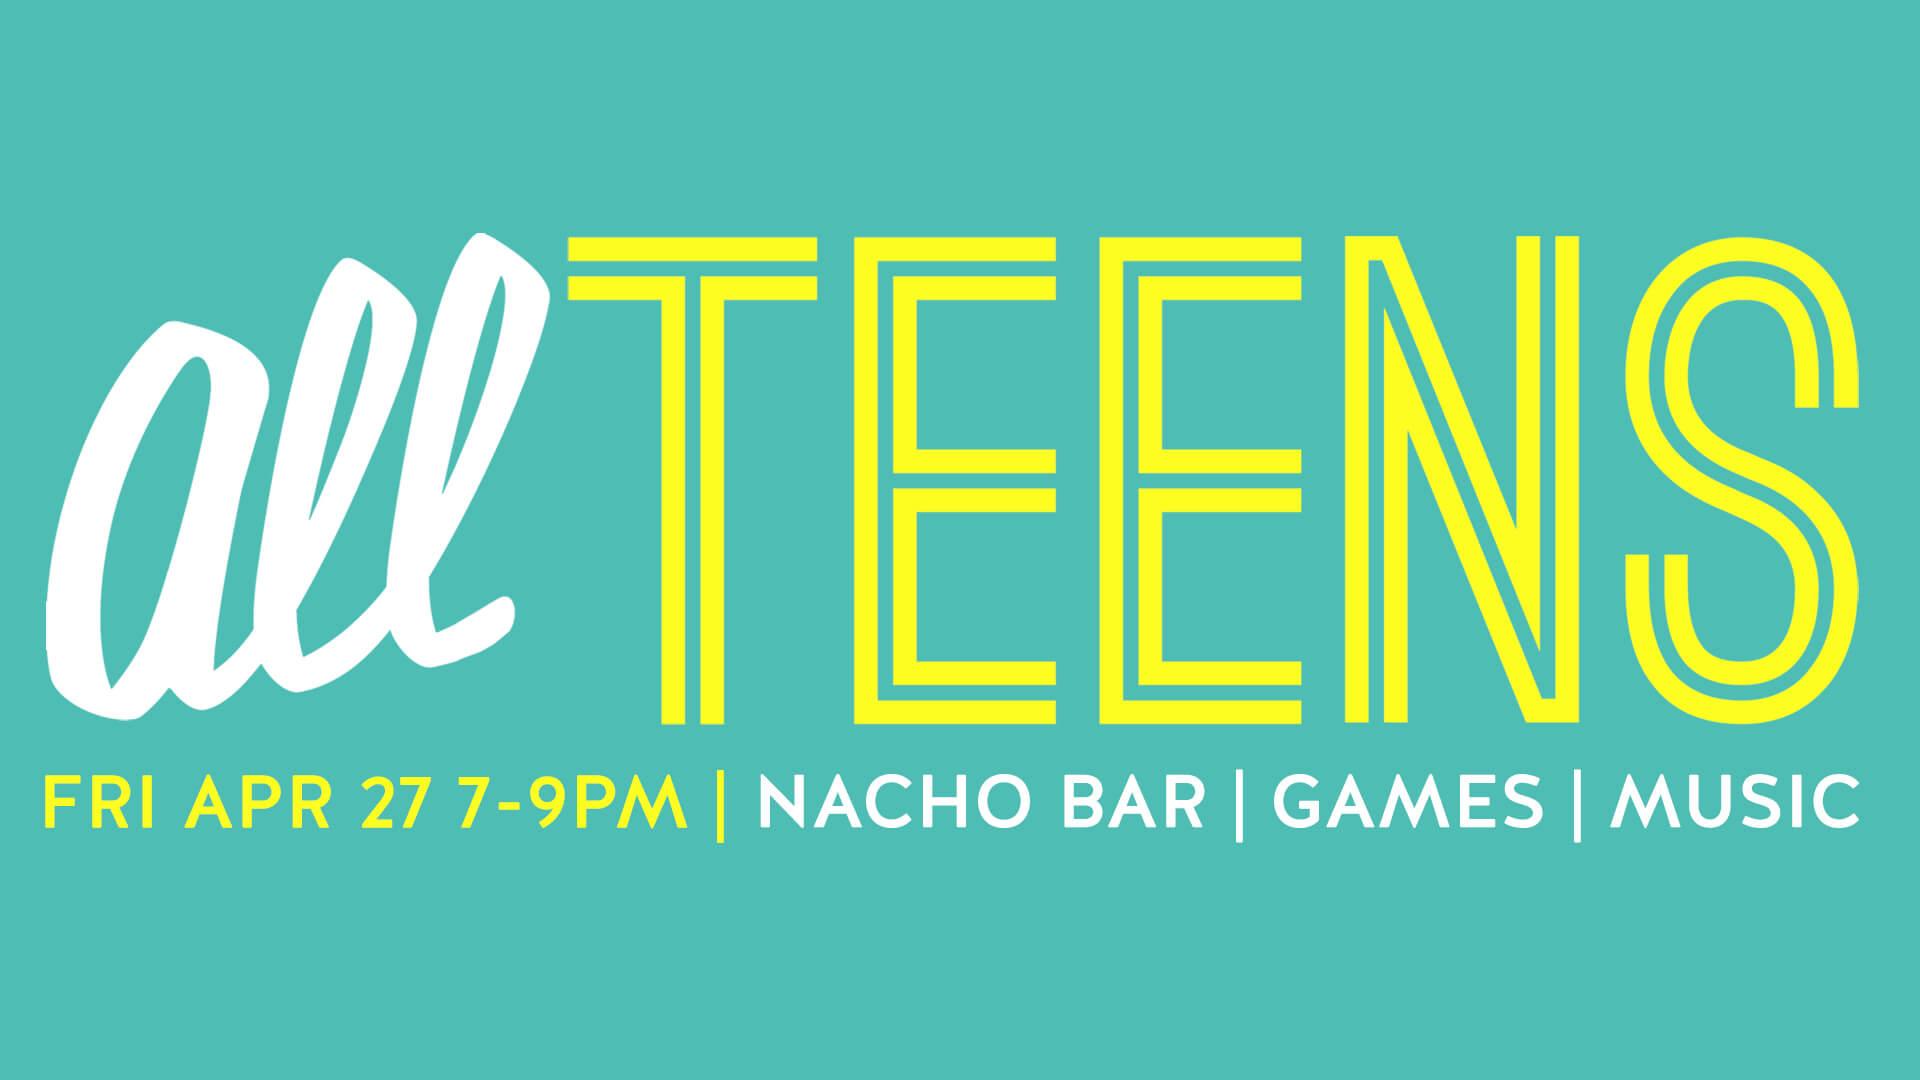 All Teens Night